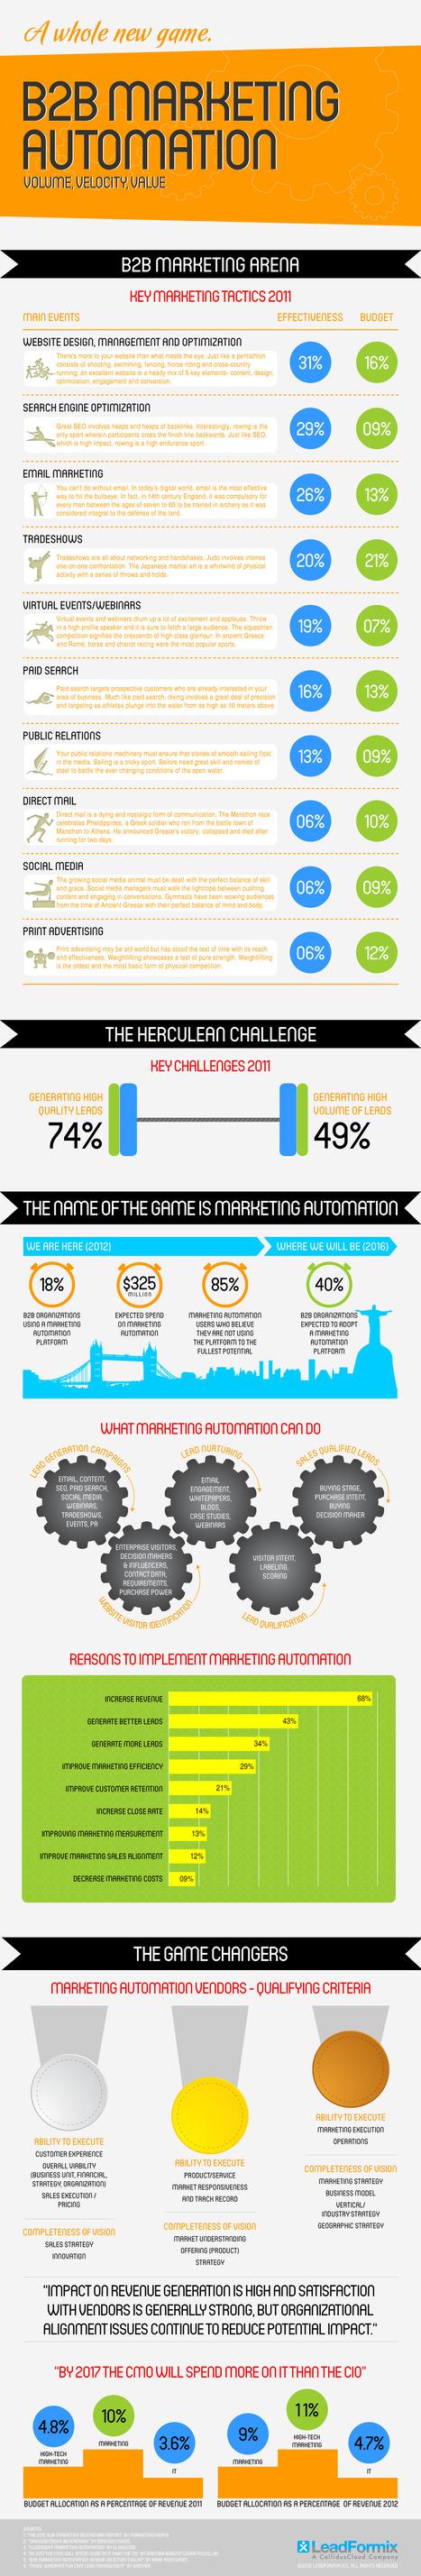 B2B Marketing Automation [INFOGRAPHIC]   B2B Marketing Automation Infographics   Scoop.it